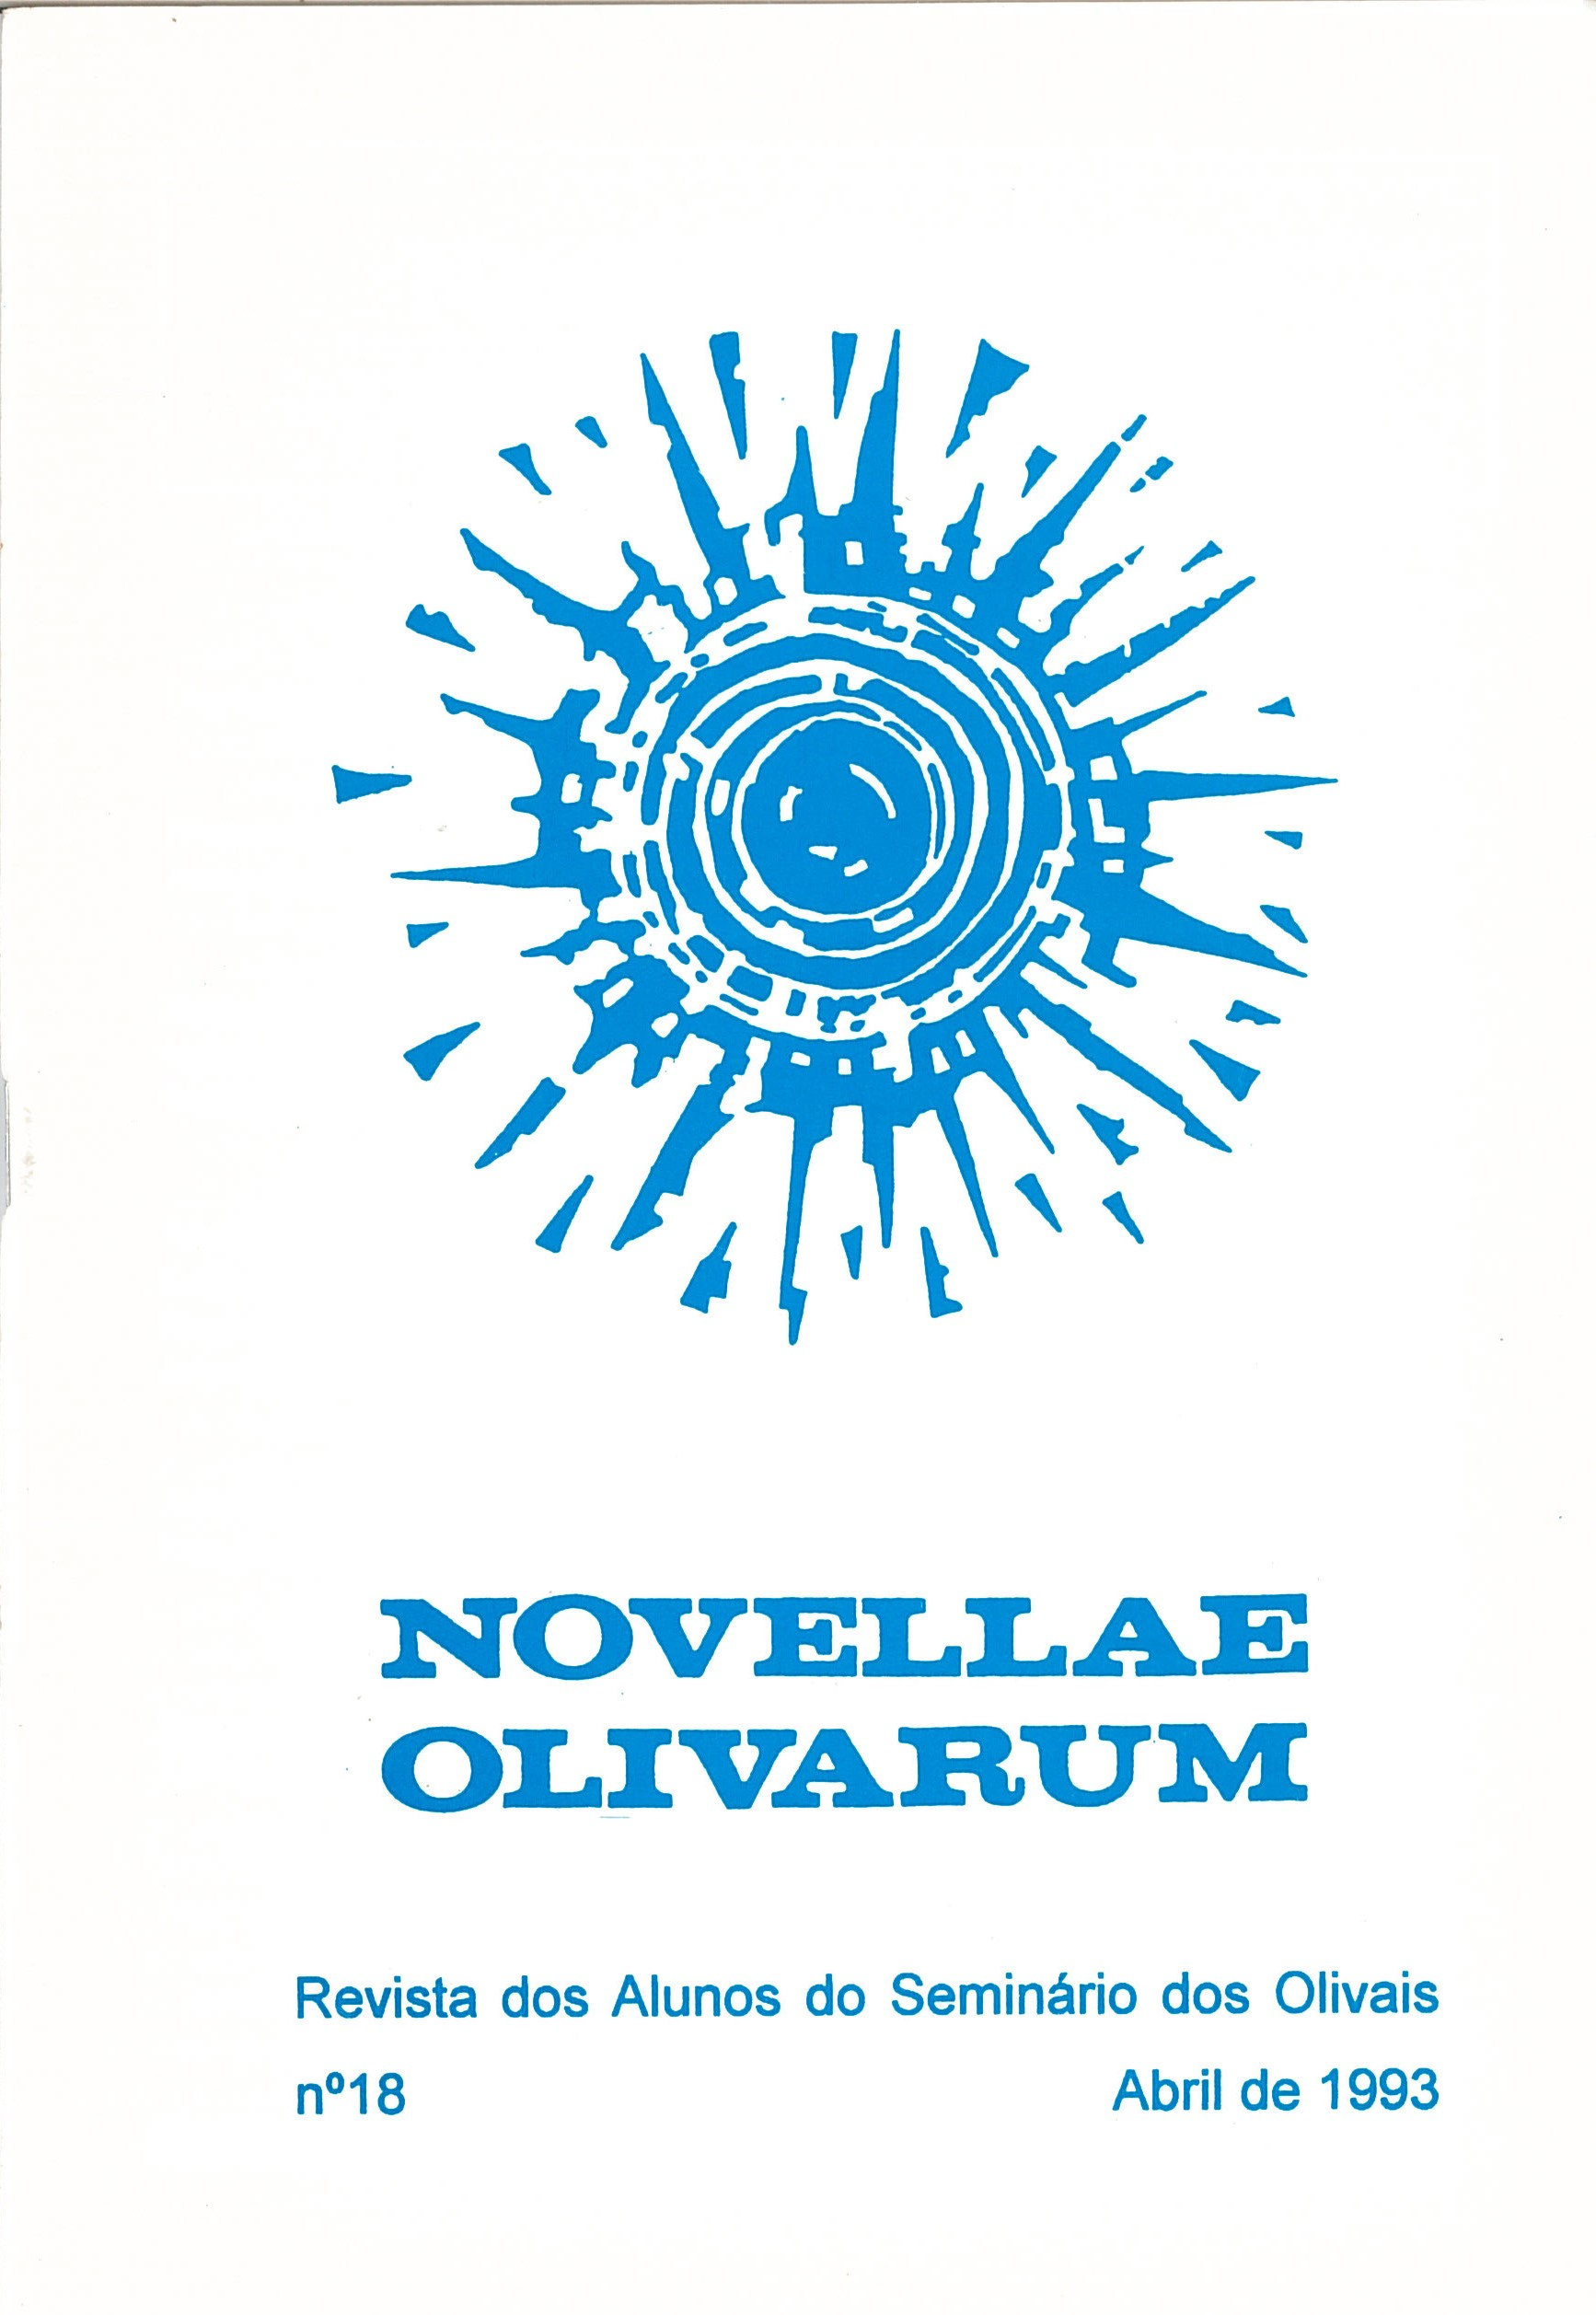 Revista Novellae Olivarum, nº 18 - Abril de 1993 (capa)